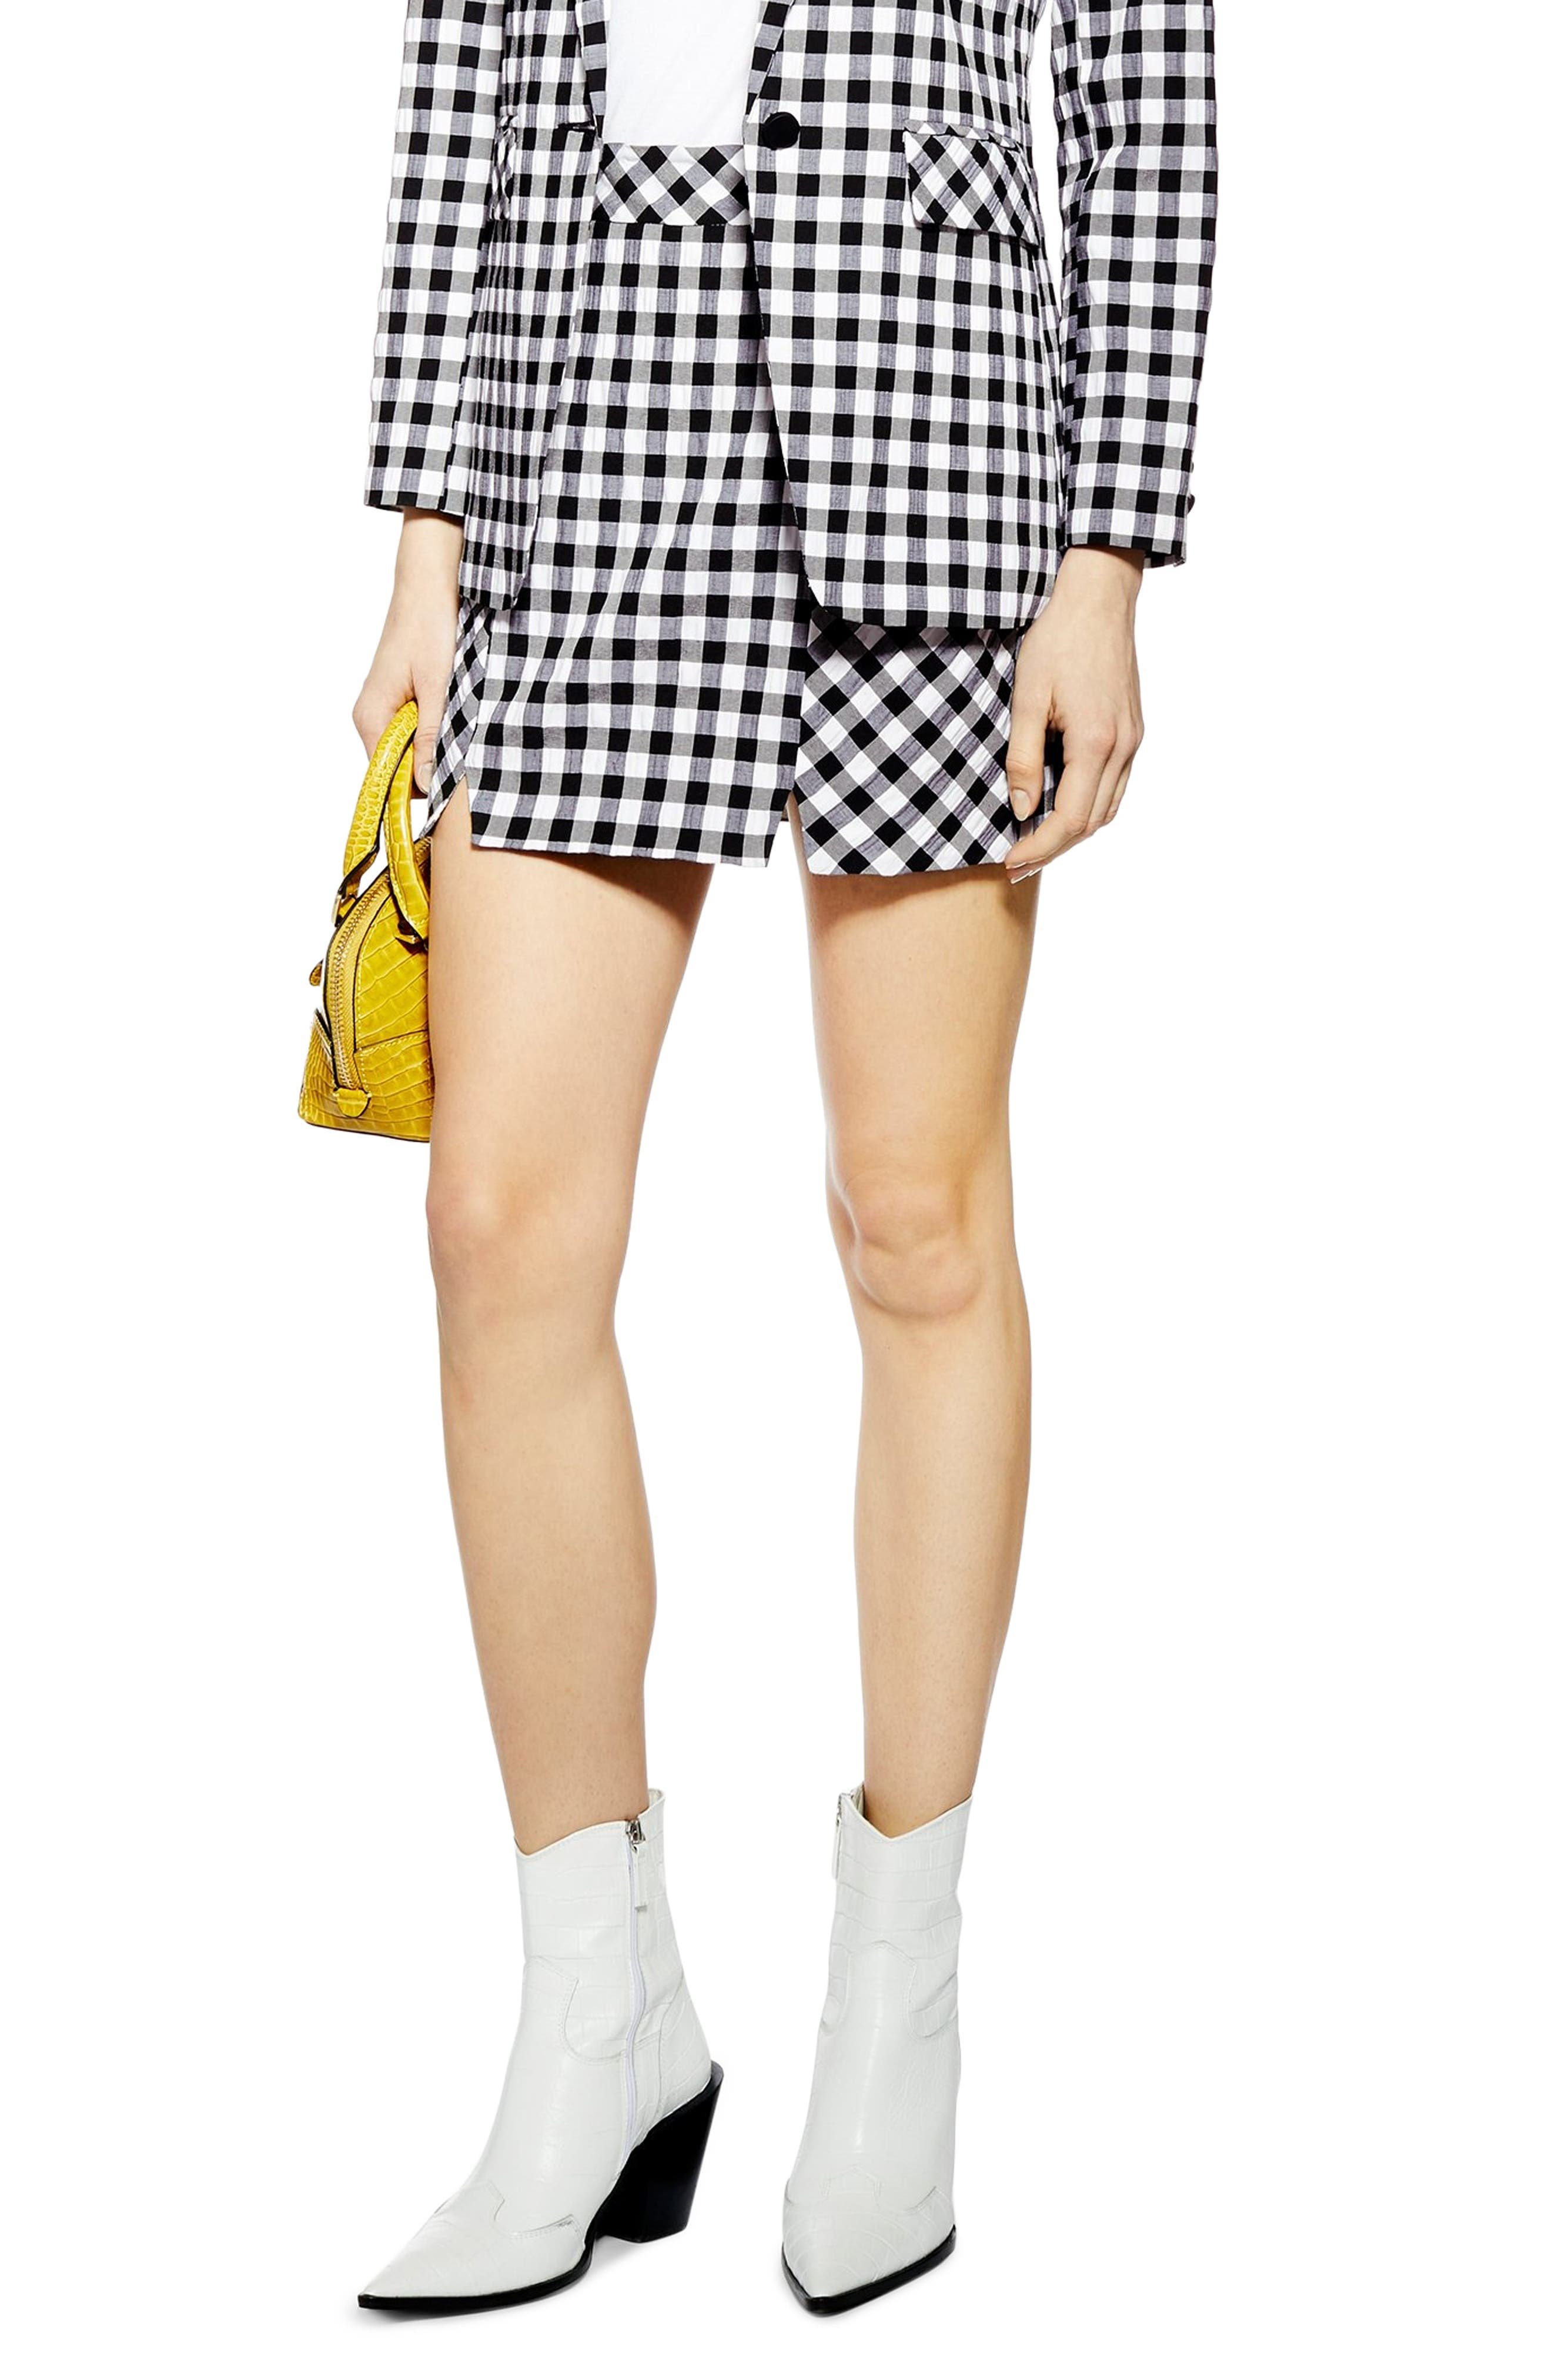 Topshop Gingham Miniskirt, US (fits like 14) - Black